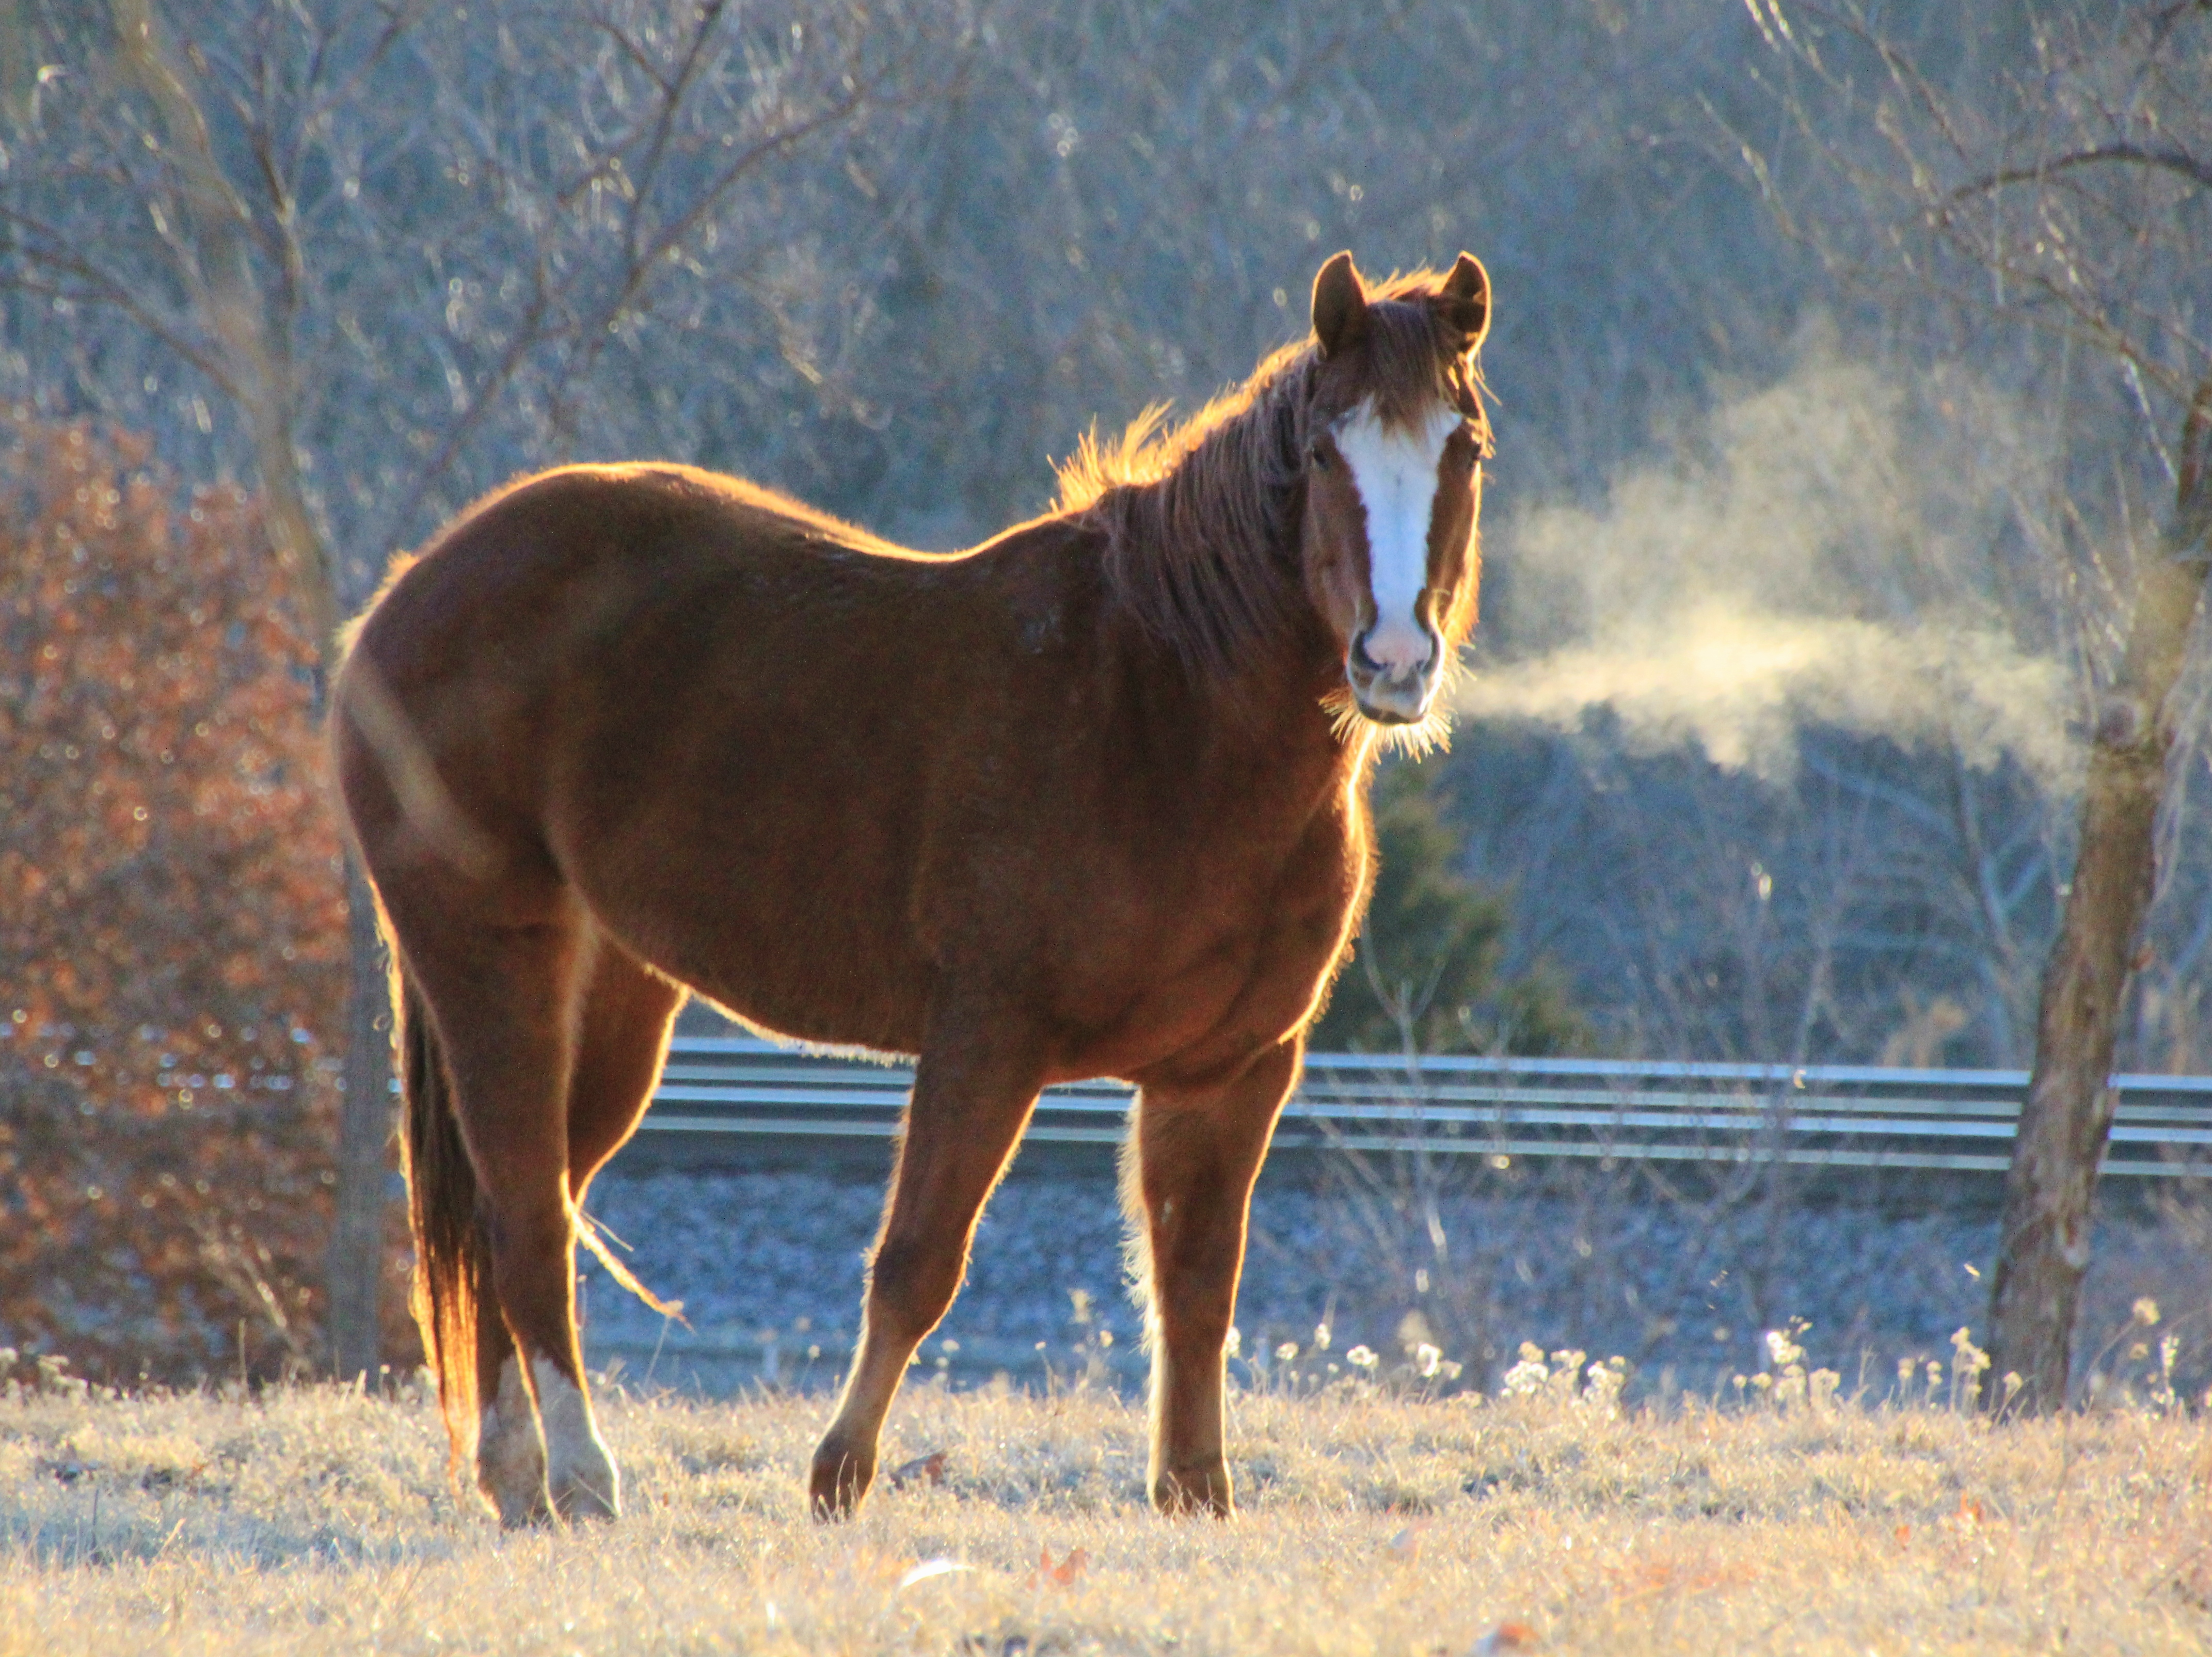 Sunlit Horse 2-26-15 006